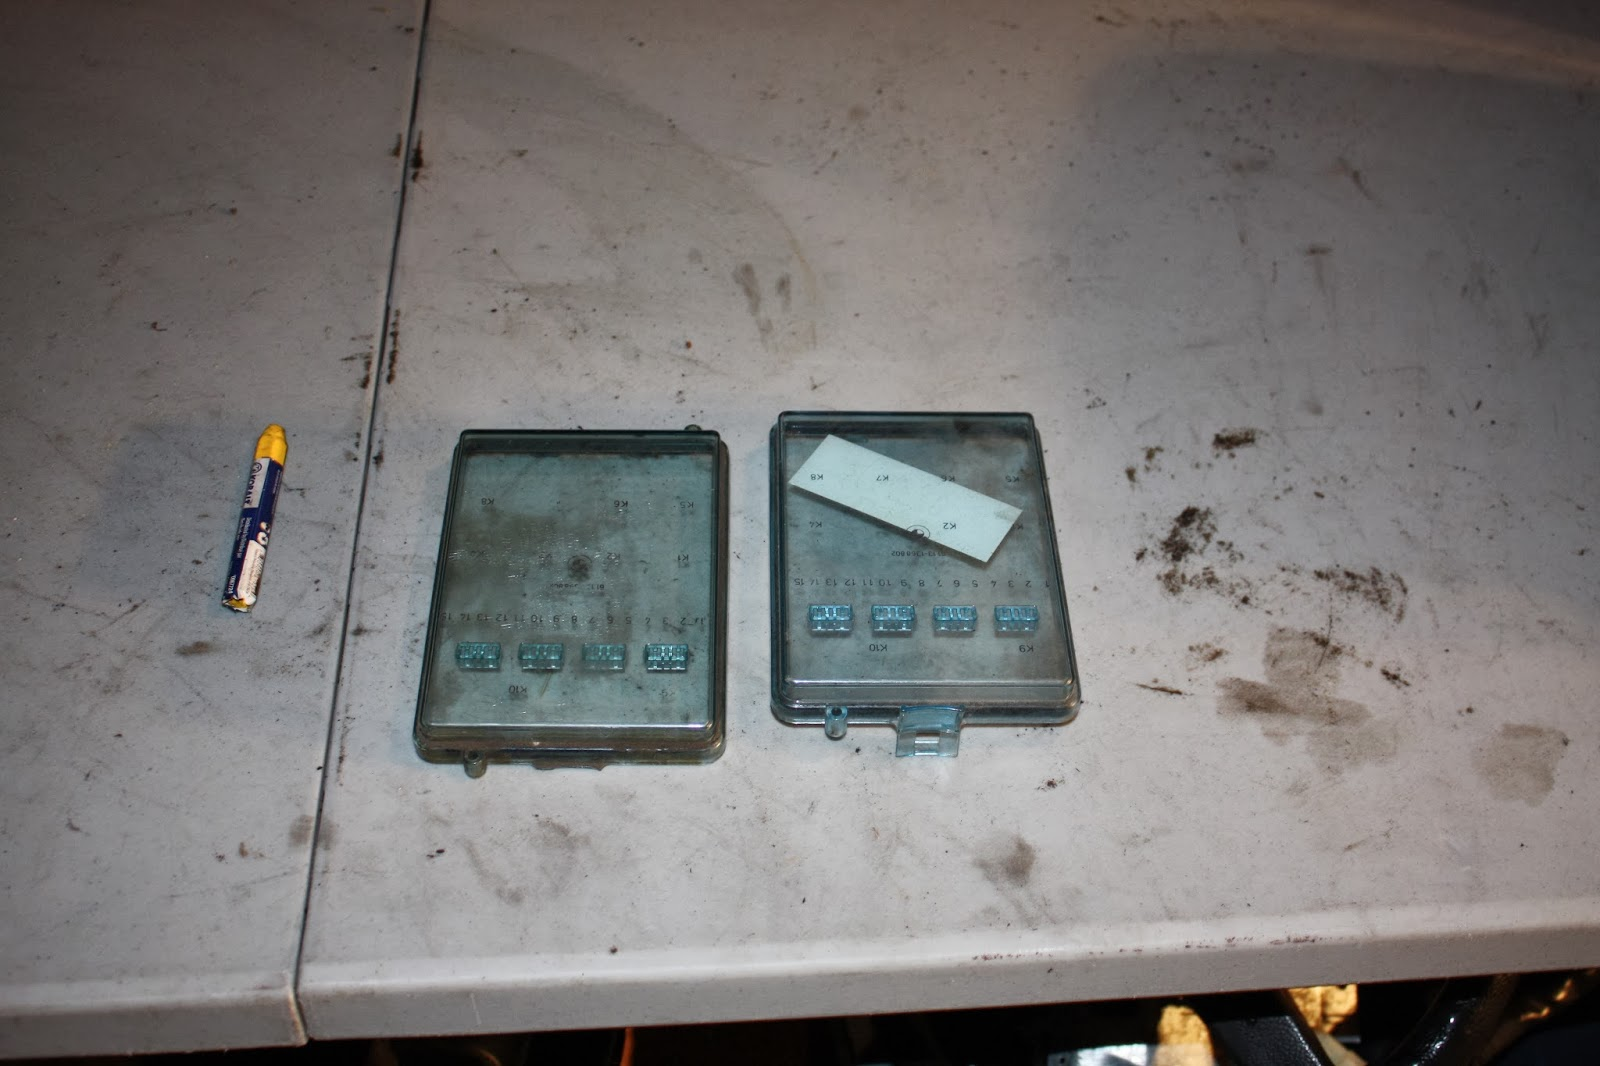 E30 Fuse Box Lid : Krevcon bmw parts e fuse box cover